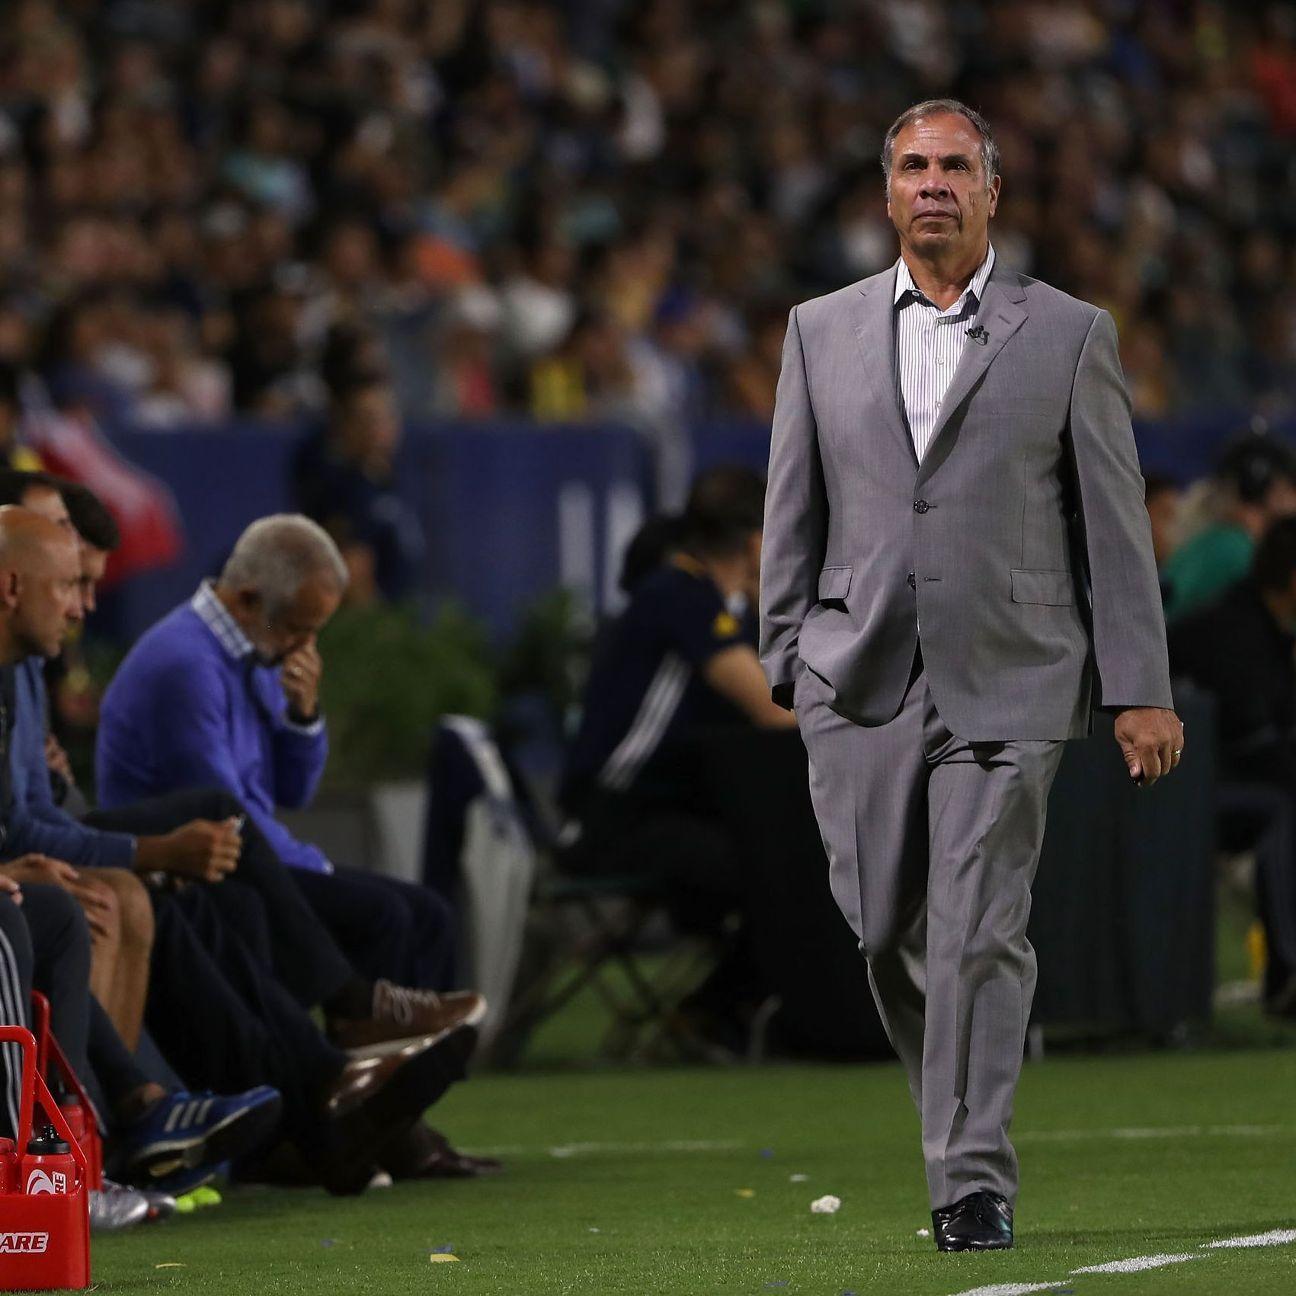 LA Galaxy coach Bruce Arena